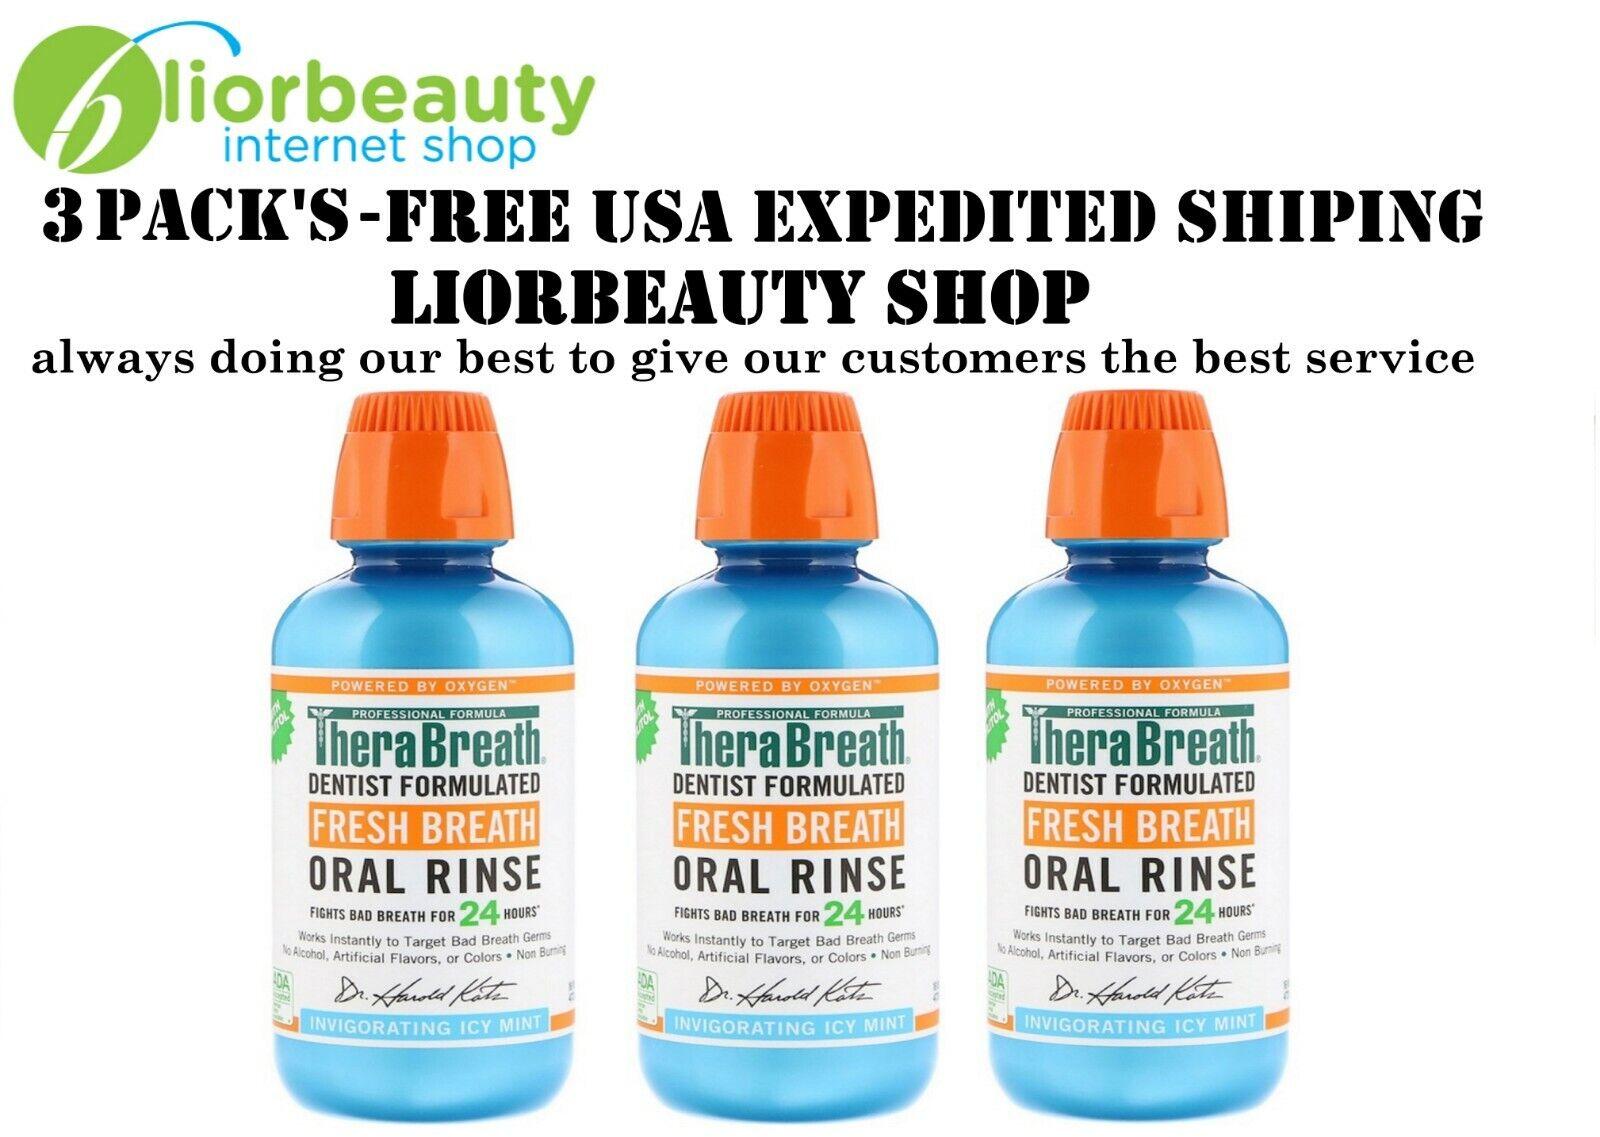 TheraBreath Fresh Breath Oral Rinse Invigorating Icy Mint